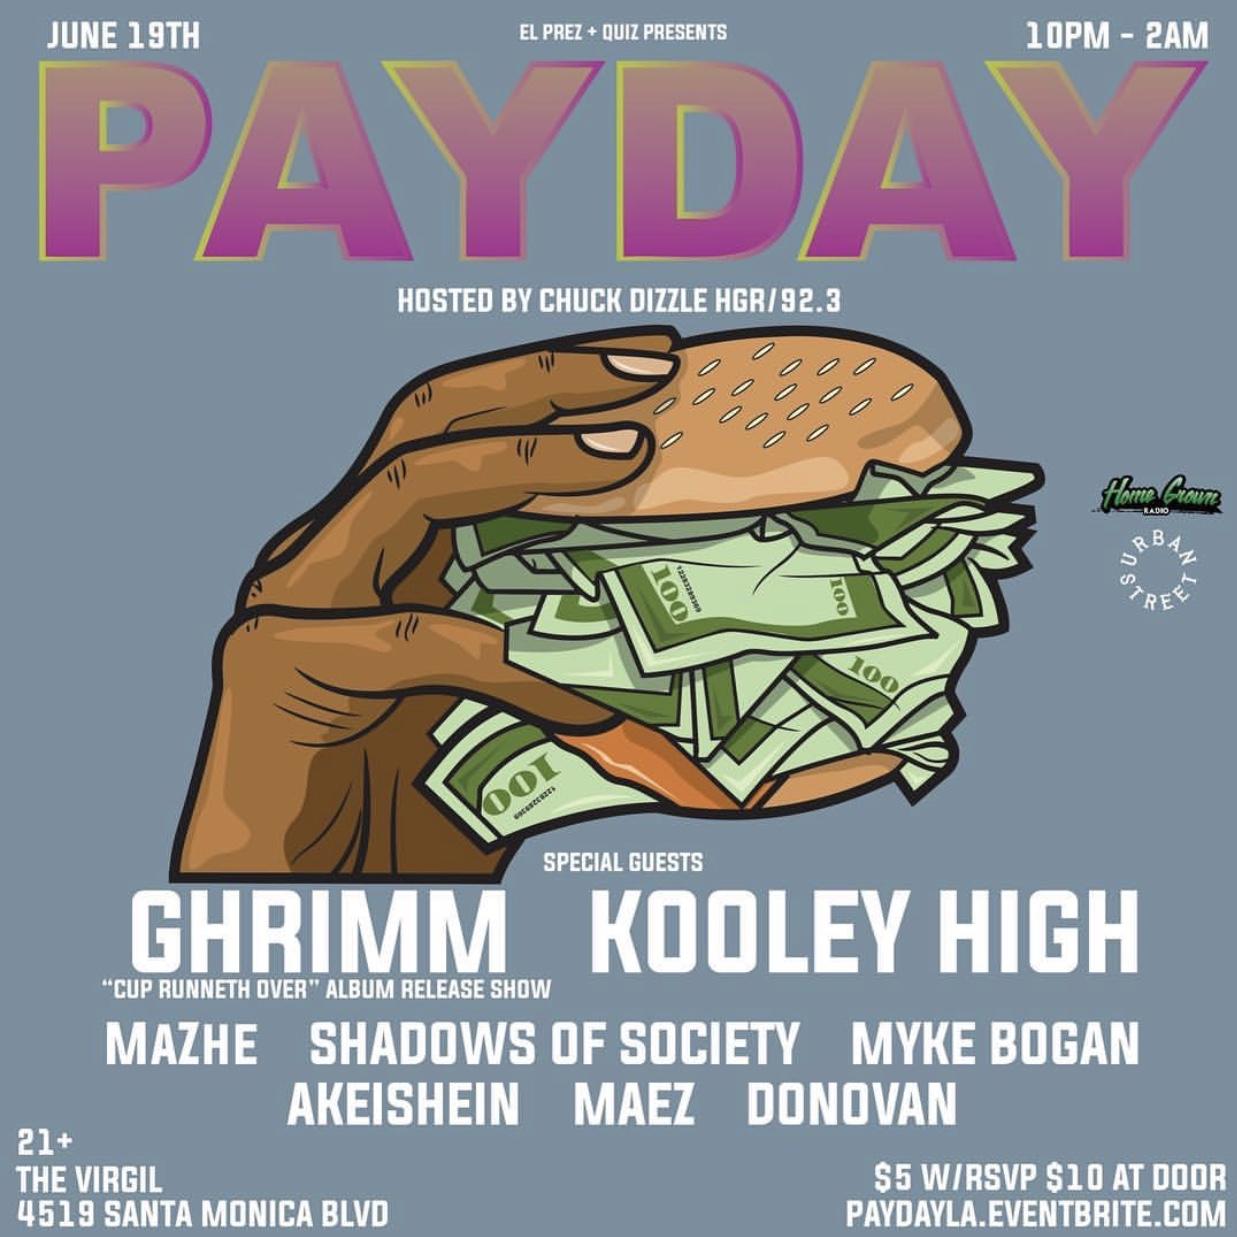 Payday LA Flyer